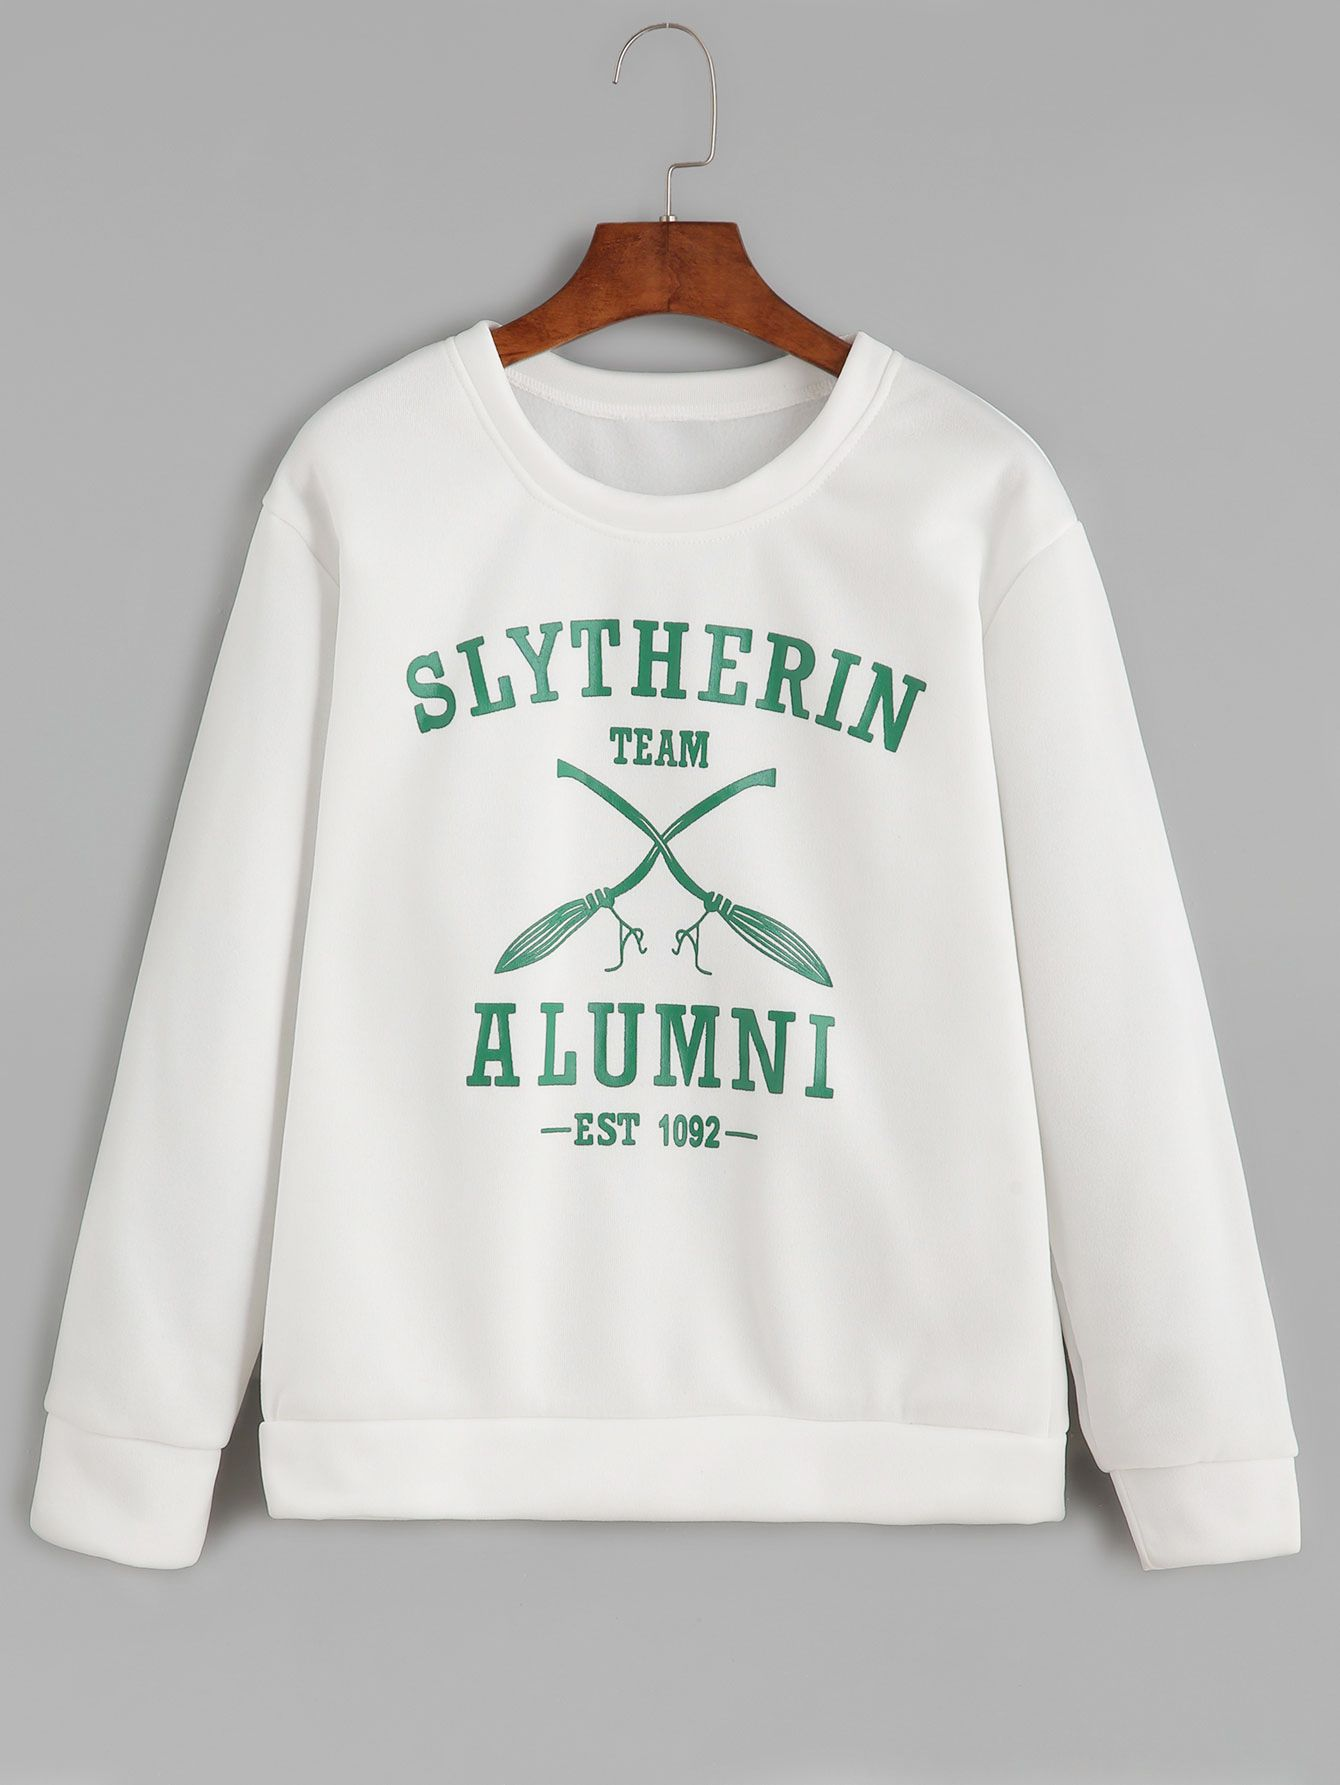 Shop White Round Neck Letters Print Sweatshirt Online Shein Offers White Round Letter Print Sweatshirt Sweatshirts Slytherin Clothes [ 1785 x 1340 Pixel ]